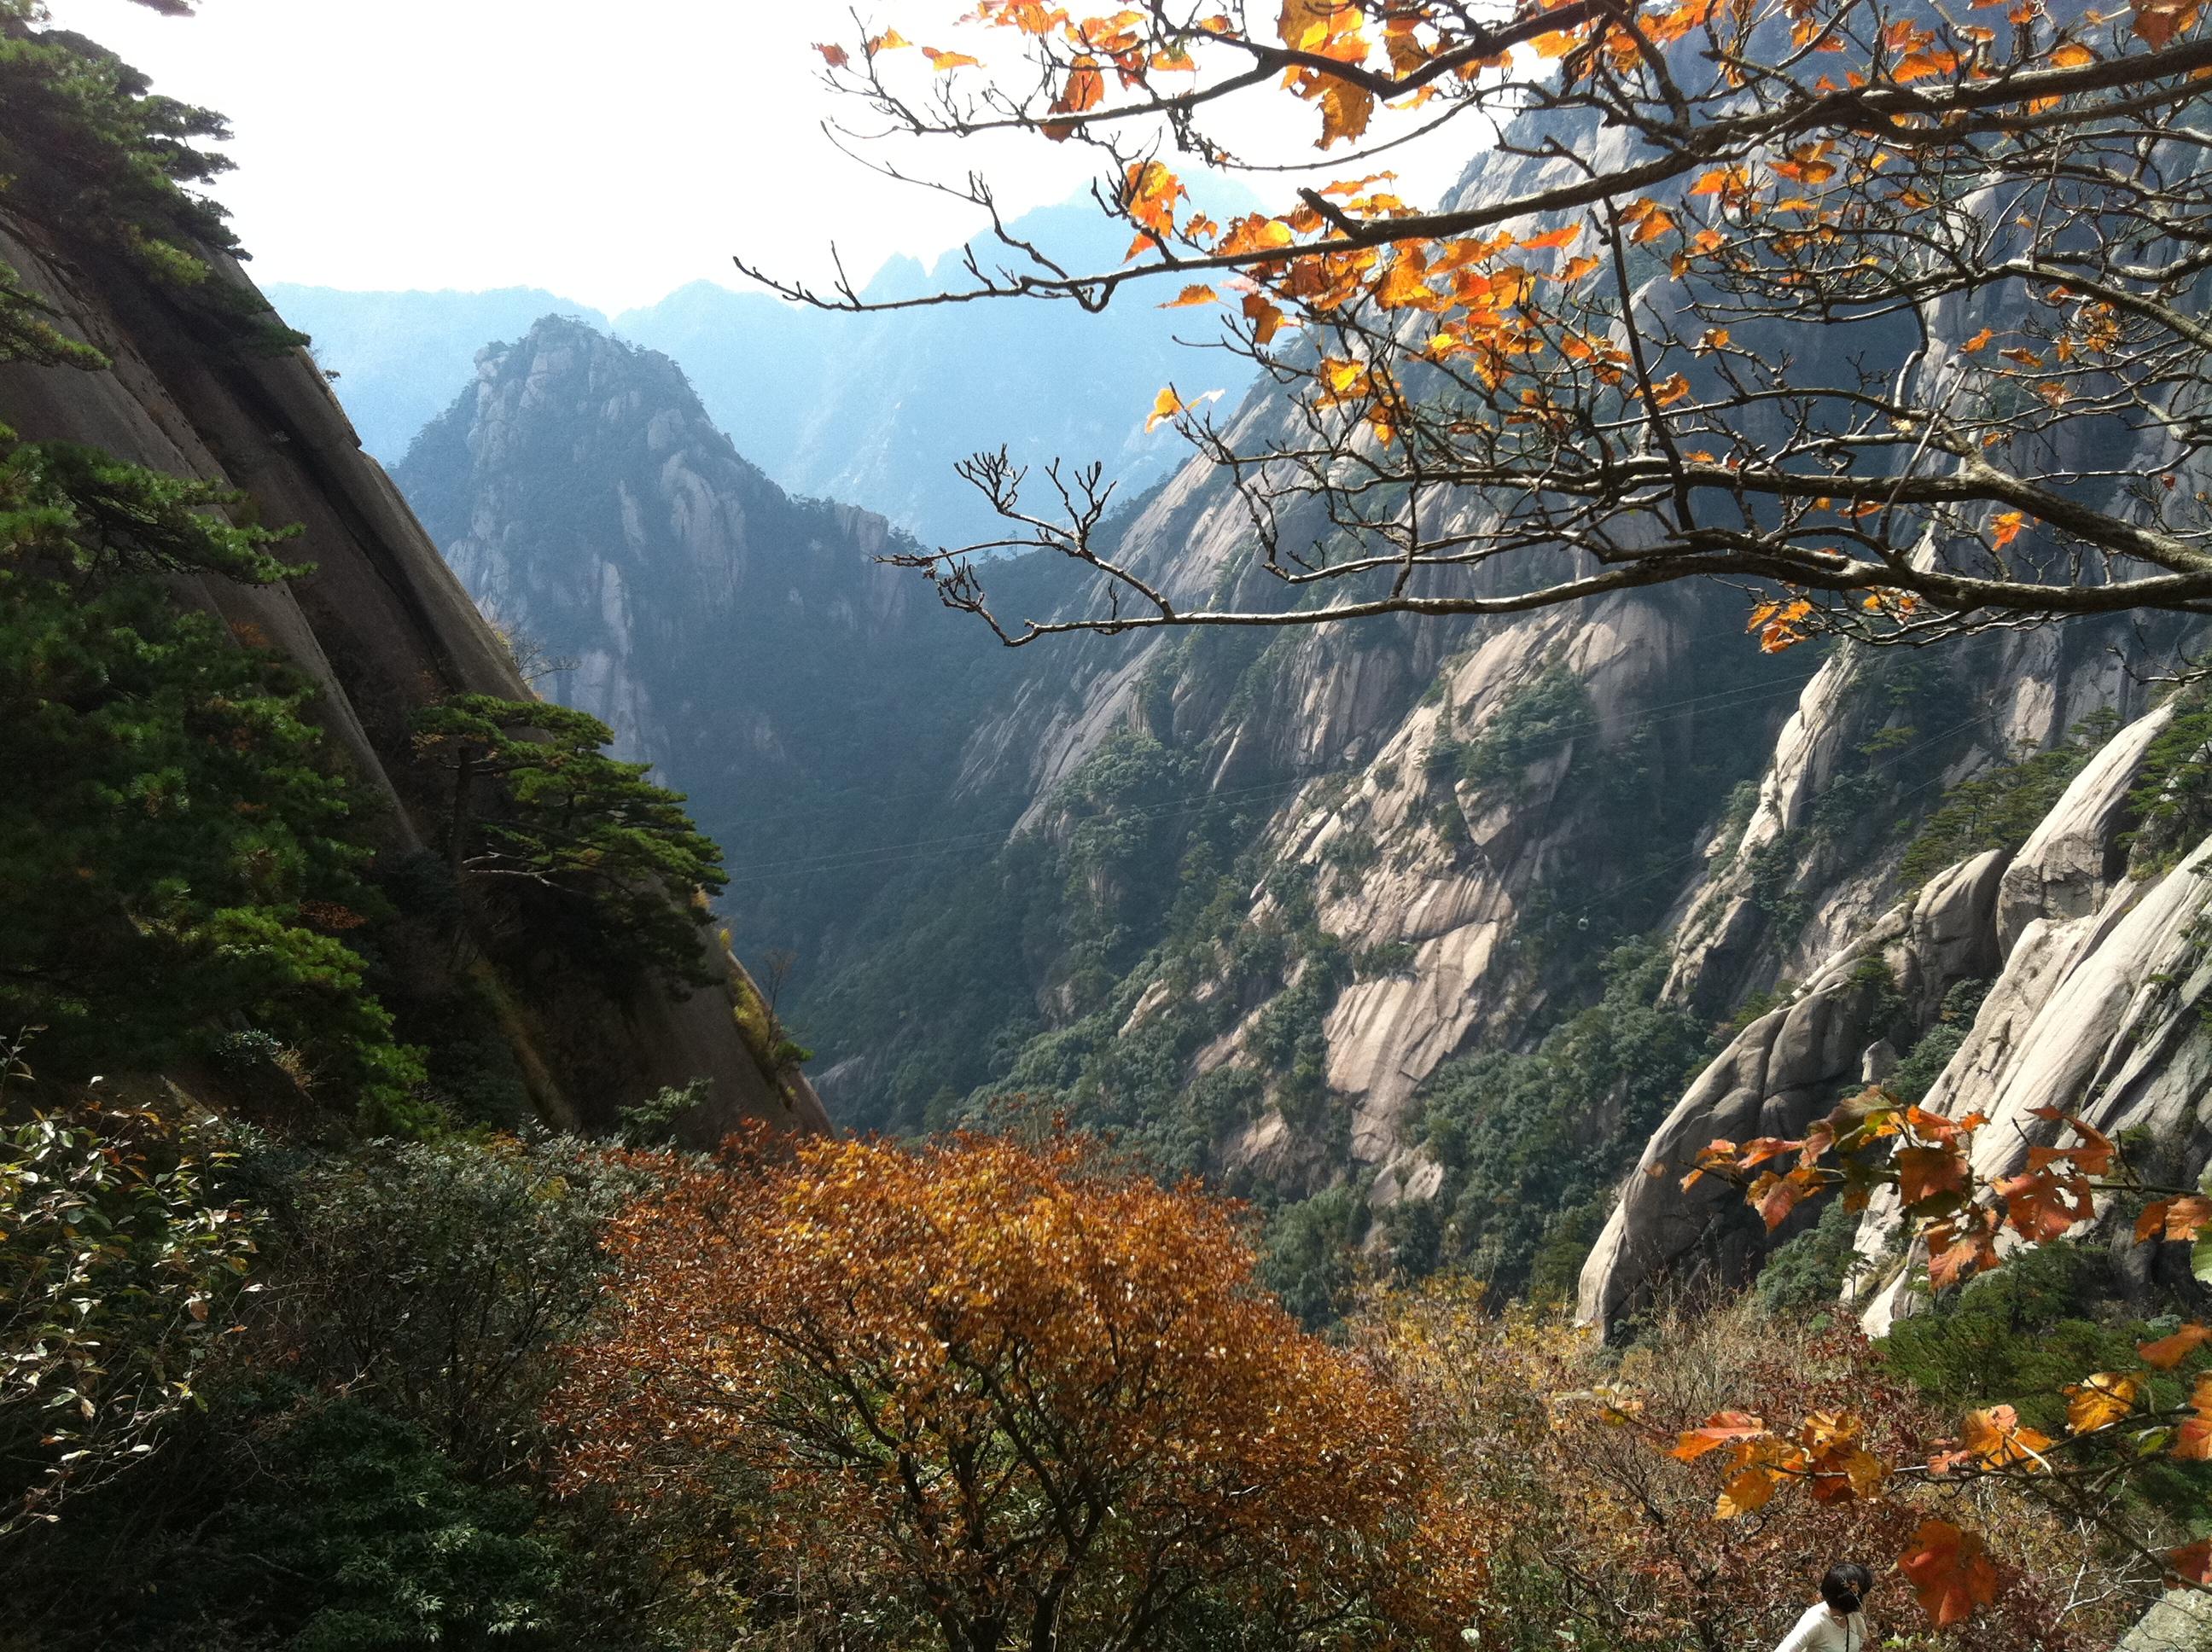 Mont huangshan